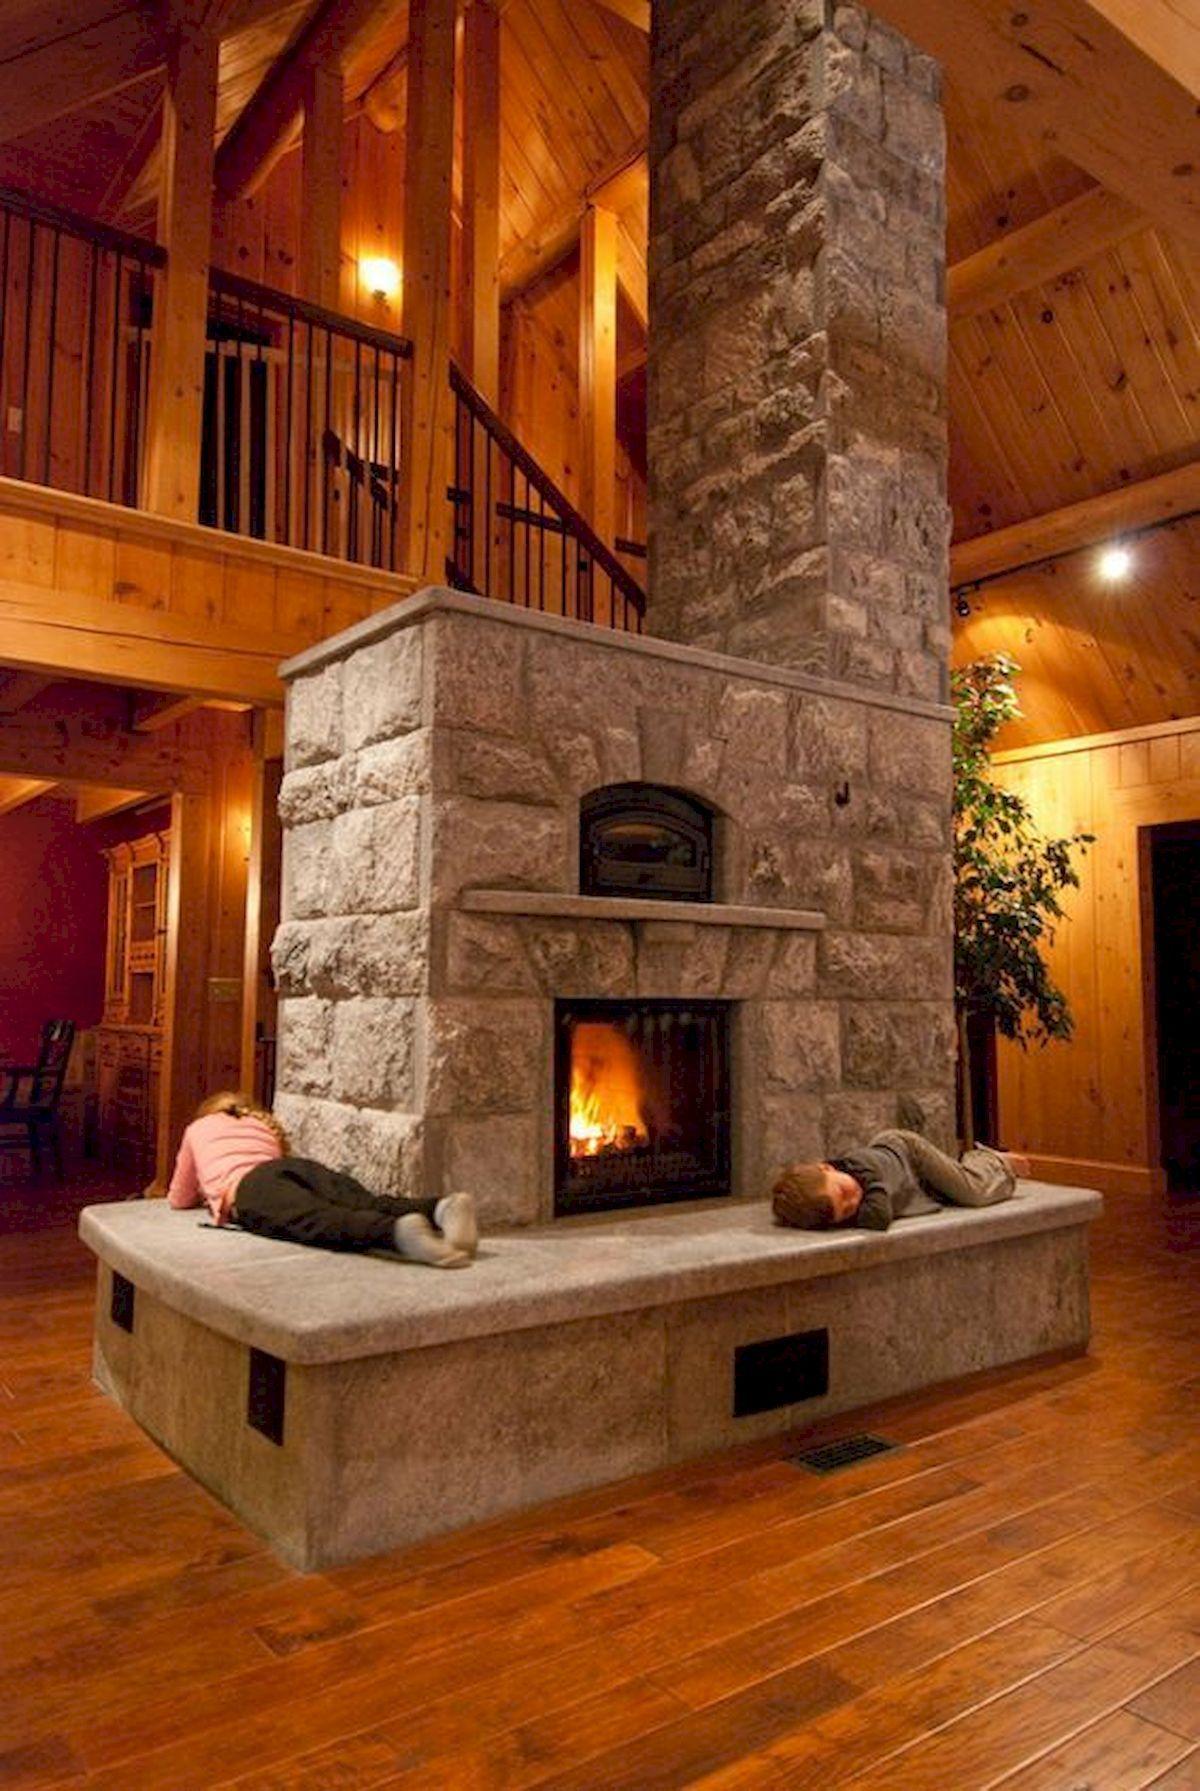 Cool 60 Stunning Log Cabin Homes Fireplace Design Ideas Https Coachdecor Com 60 Stunning Log Cabin Homes Fireplace De Home Fireplace Cabin Homes Rustic House